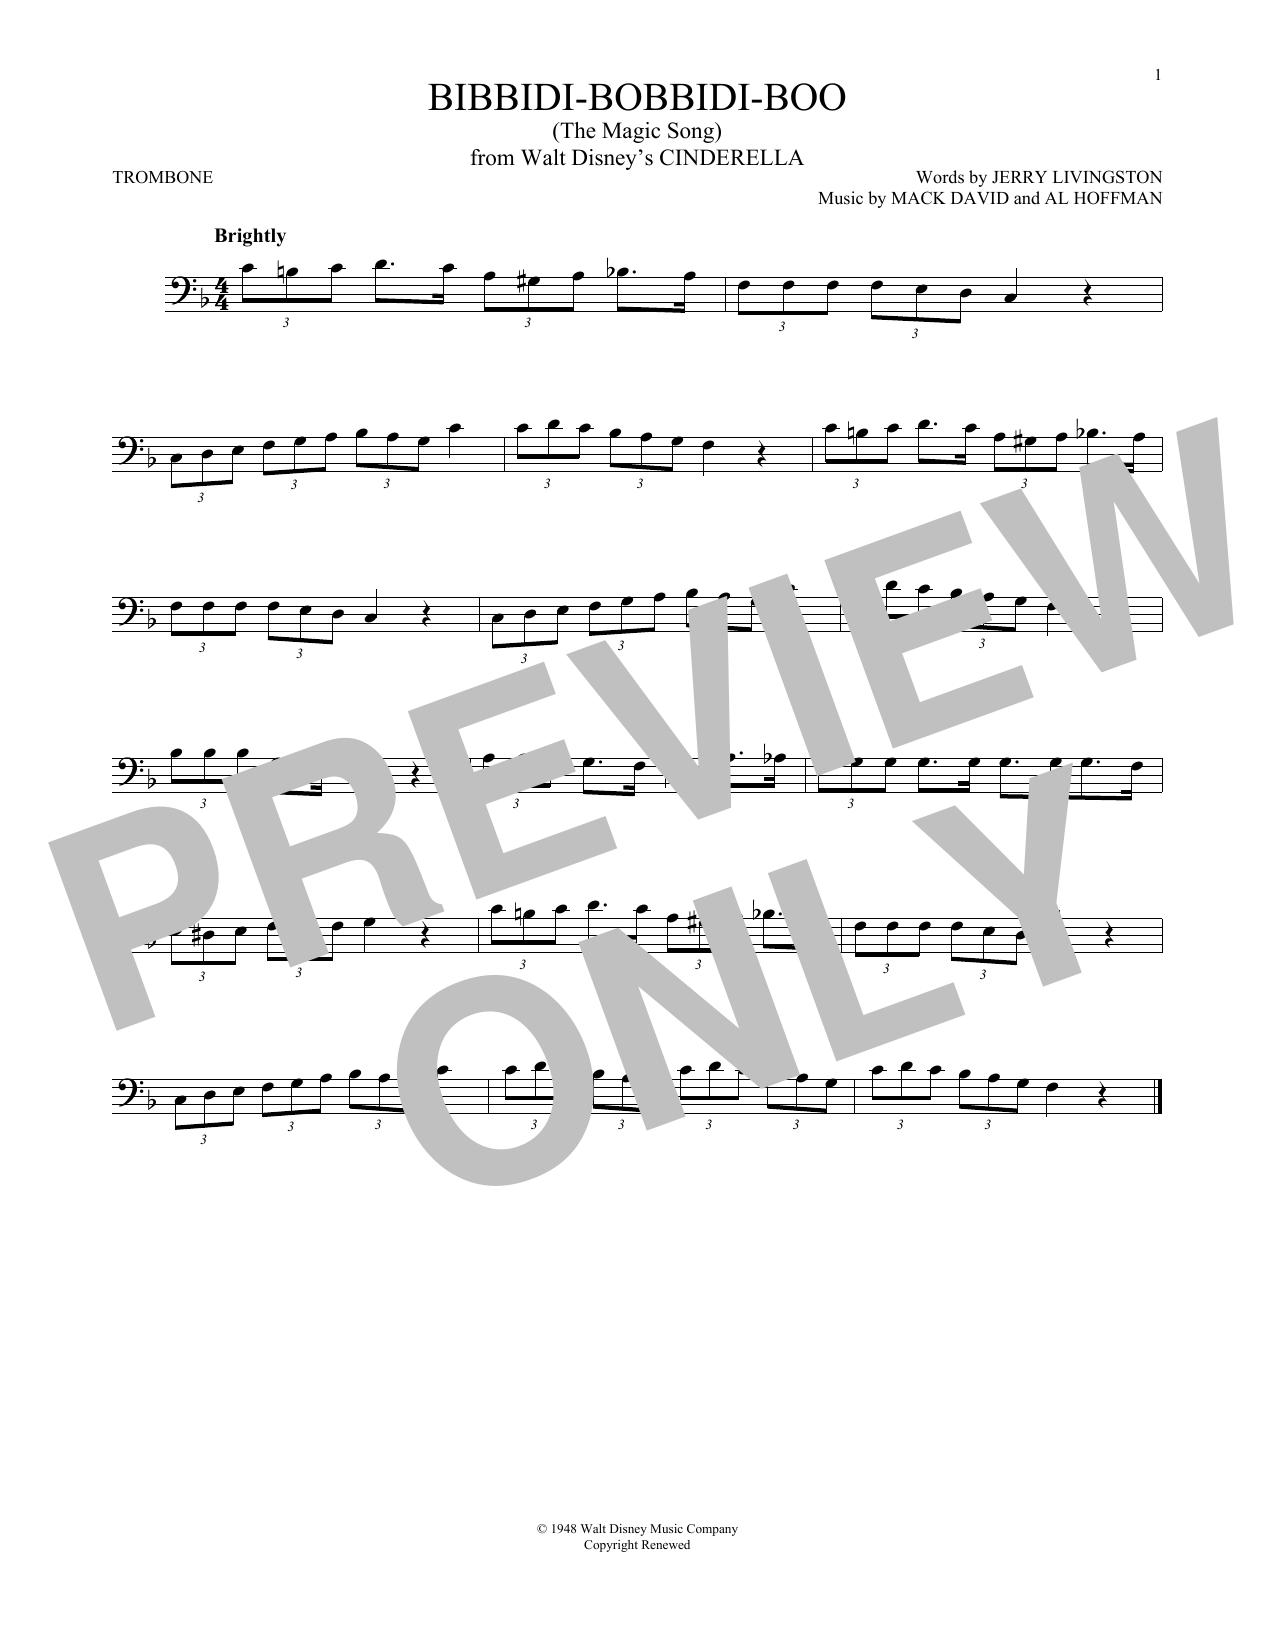 Bibbidi-Bobbidi-Boo (The Magic Song) (from Disney's Cinderella) (Trombone Solo)